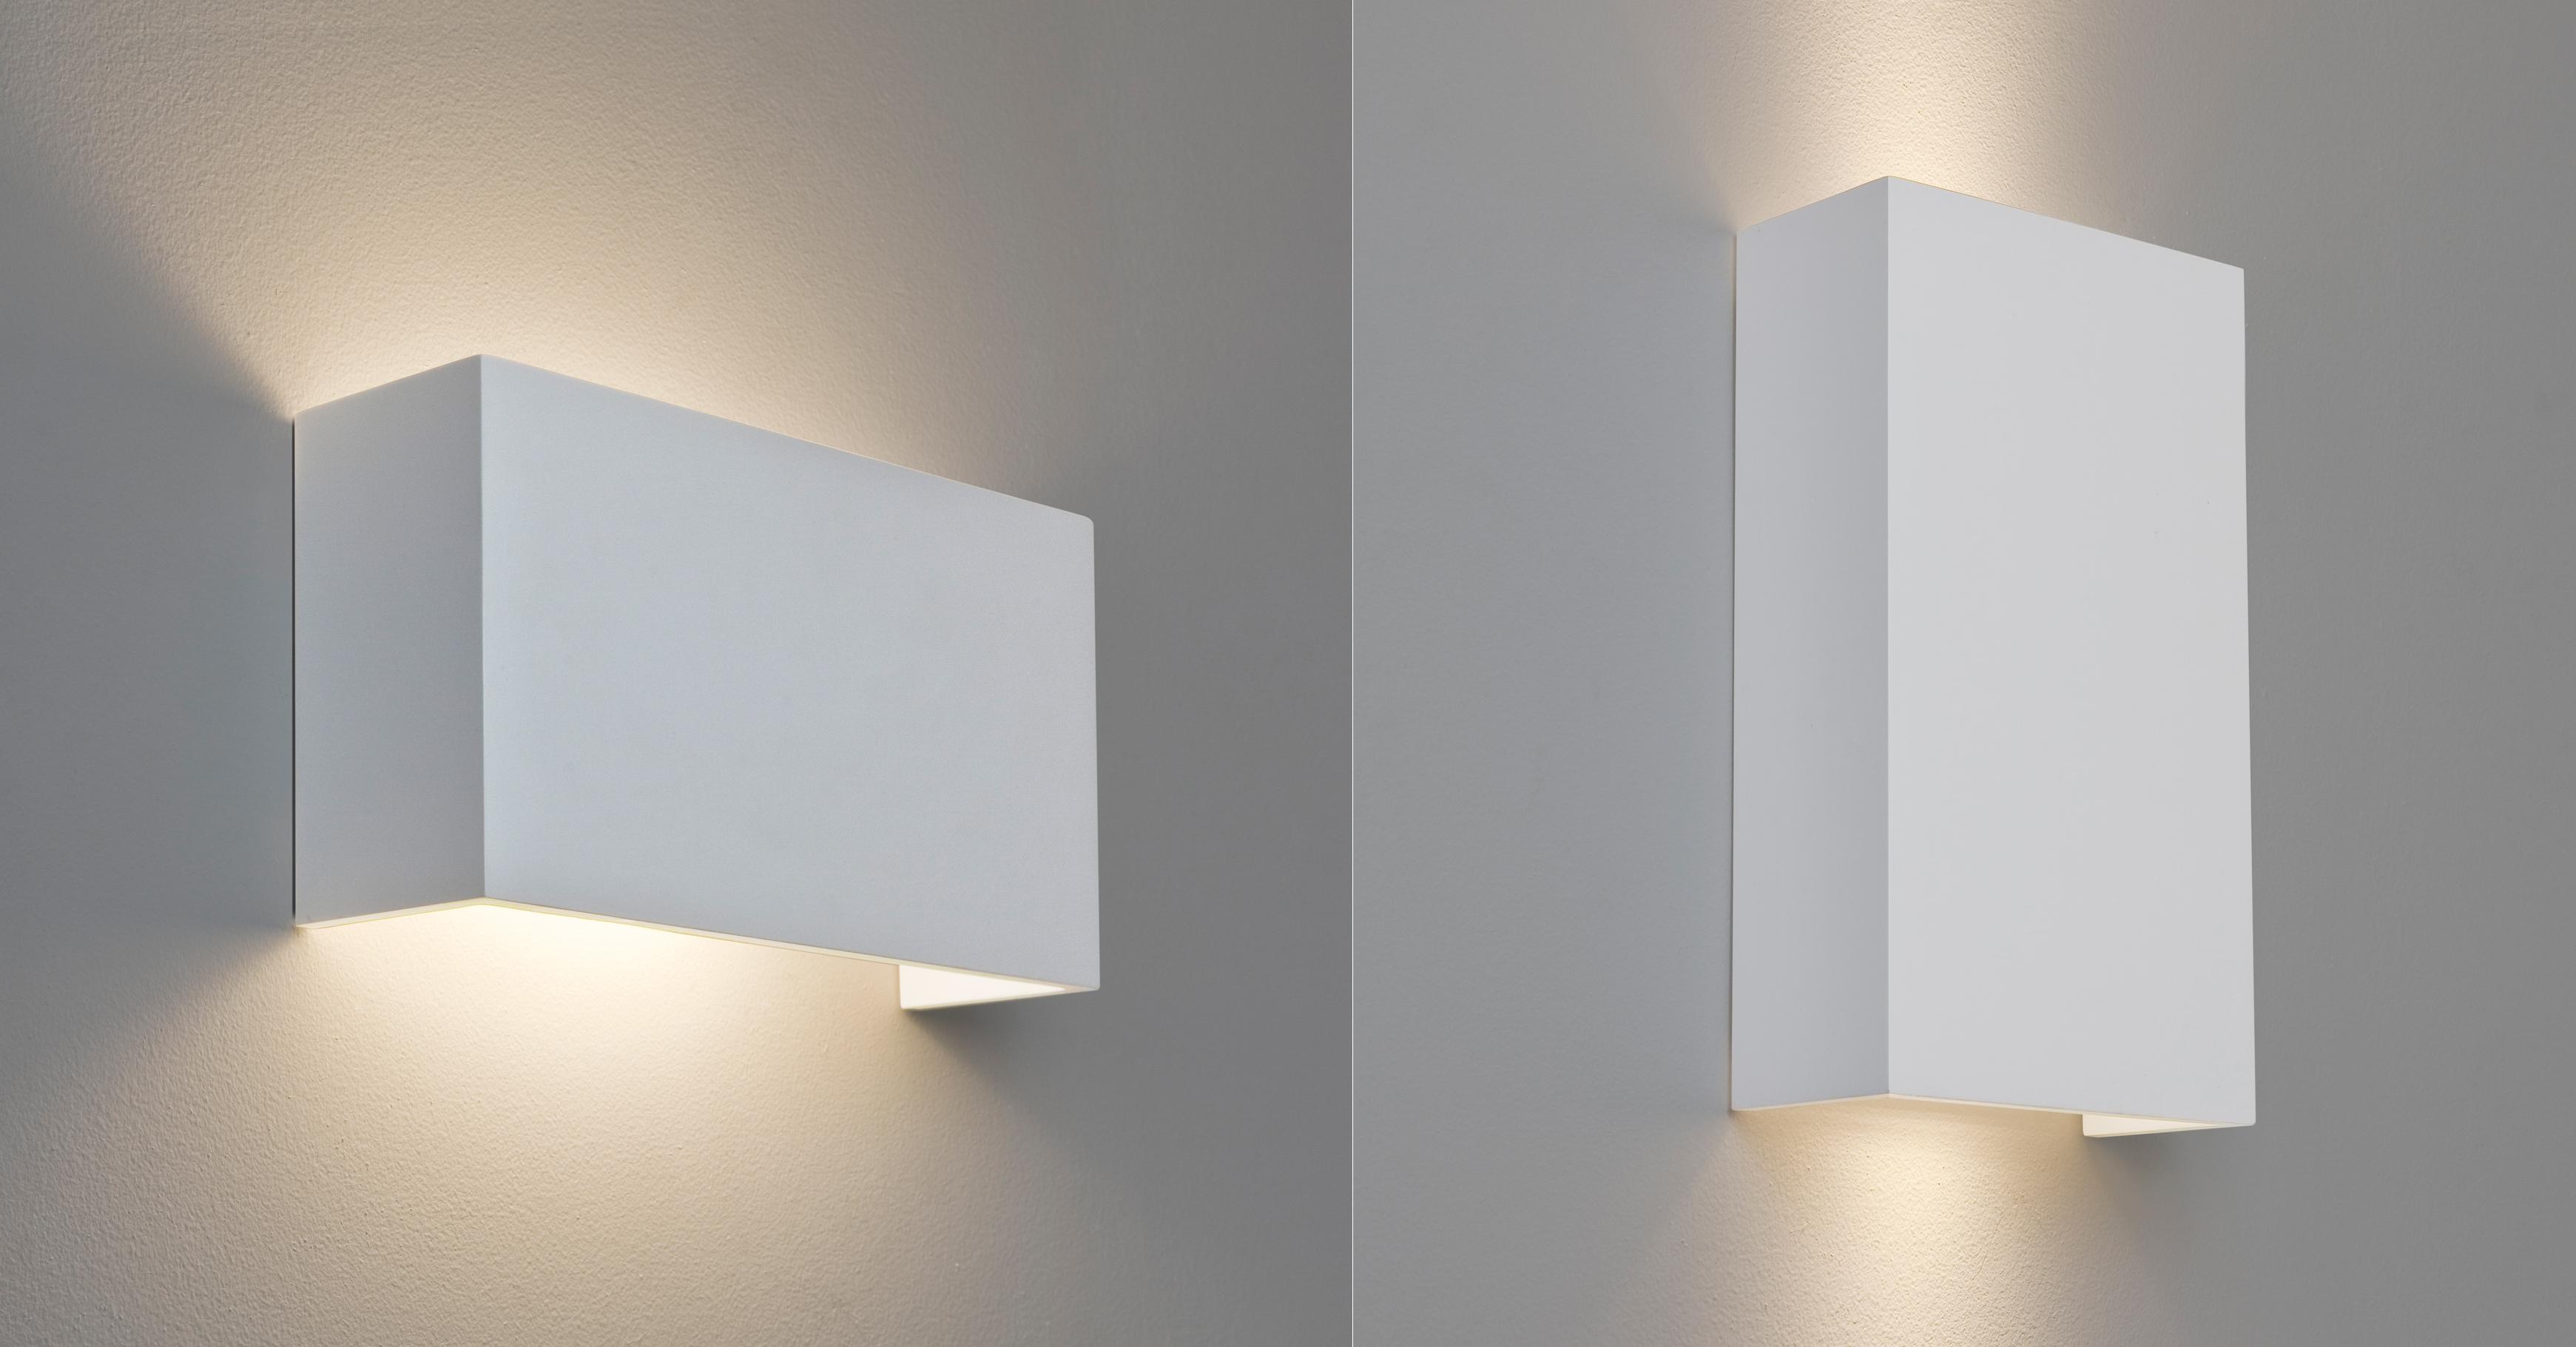 astro pella rectangular plaster ceramic wall light horizontal vertical up down ebay. Black Bedroom Furniture Sets. Home Design Ideas